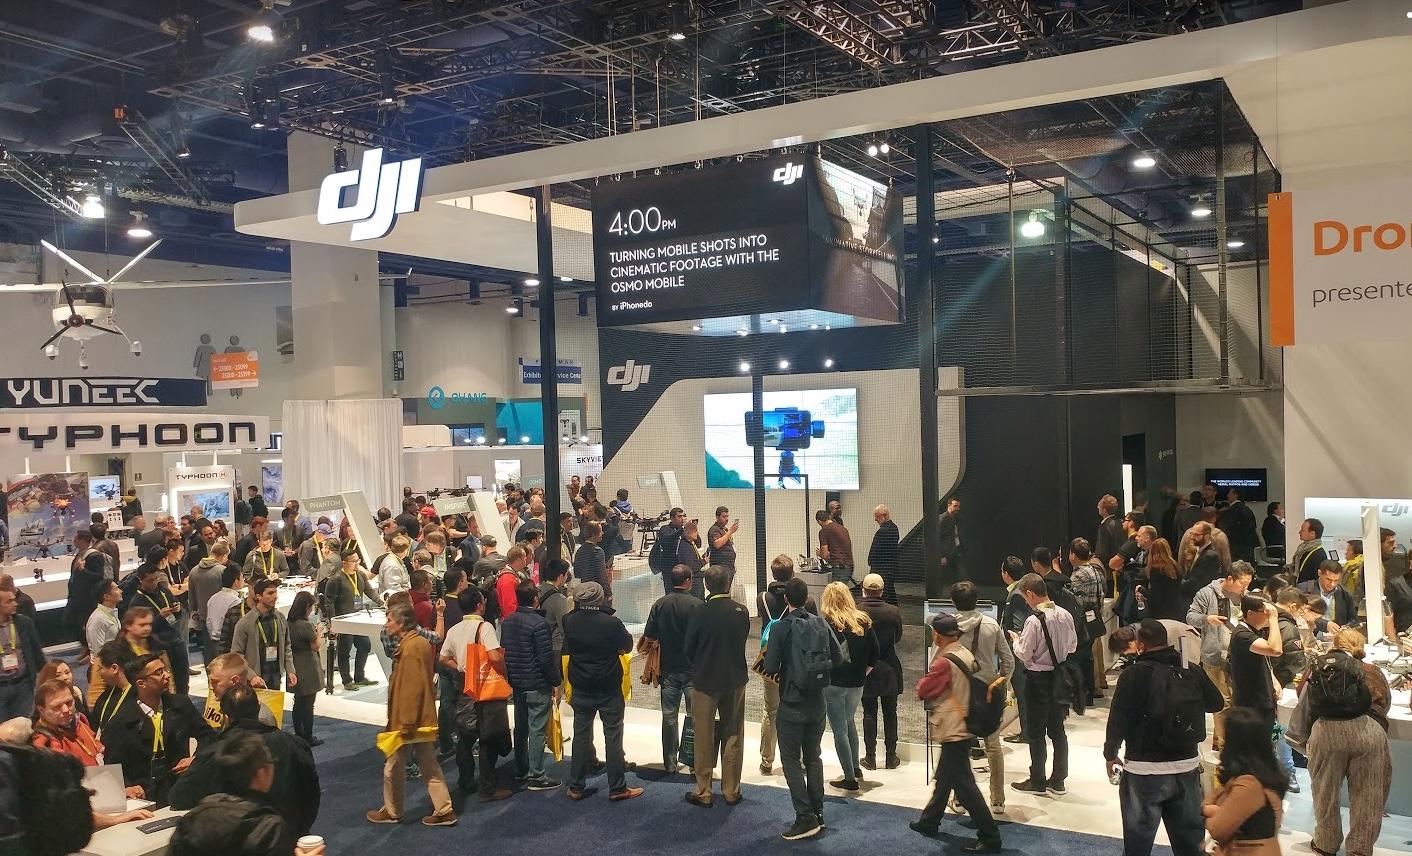 Wireless broadcasting to a TV | DJI Mavic Drone Forum